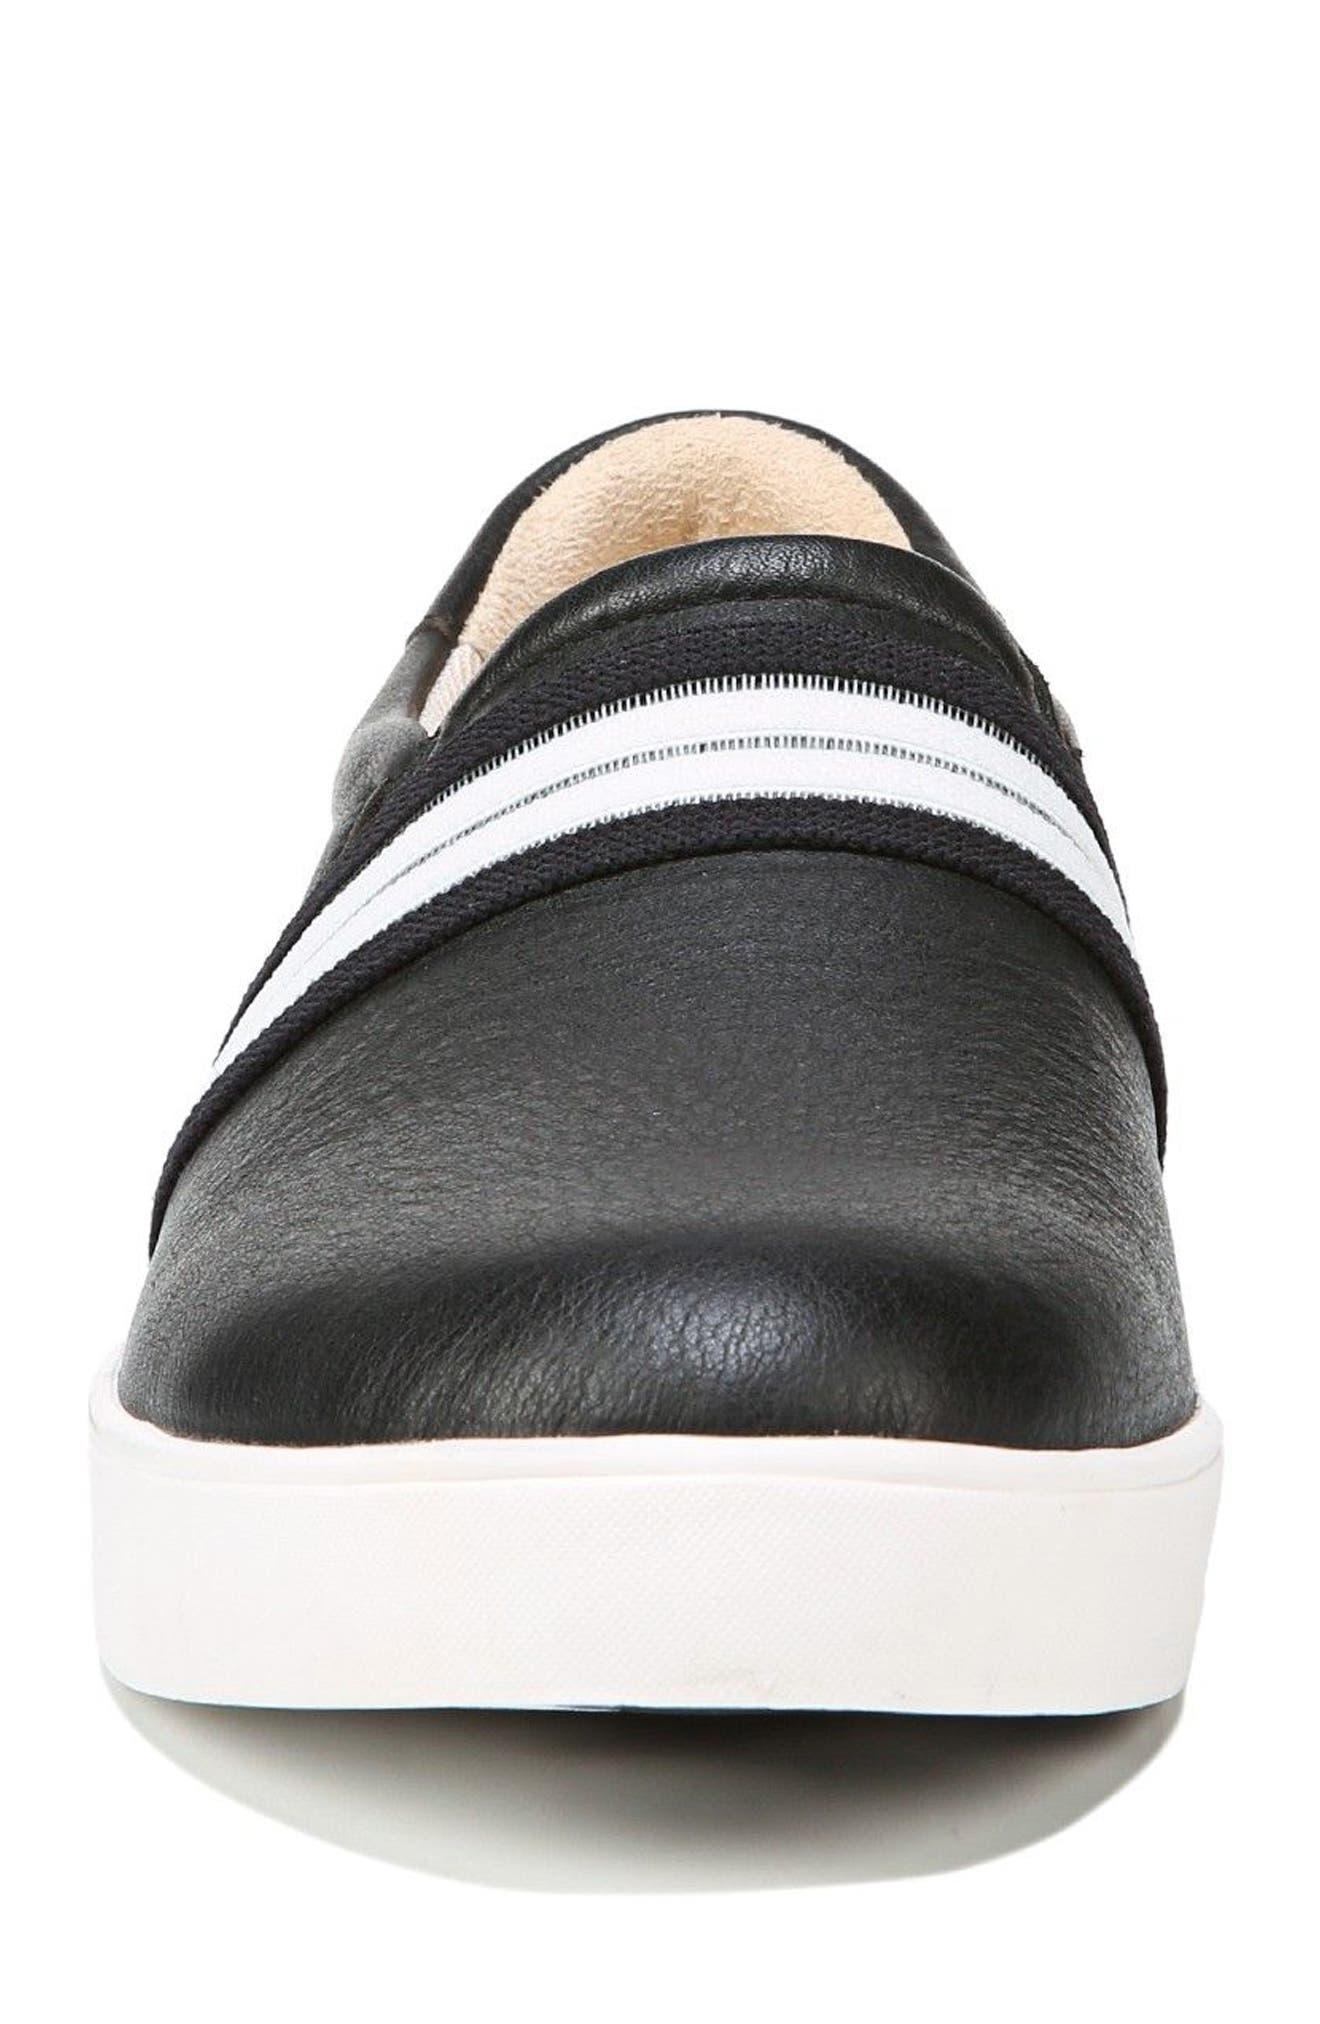 DR. SCHOLL'S, Scout Slip-On Sneaker, Alternate thumbnail 4, color, BLACK LEATHER 2